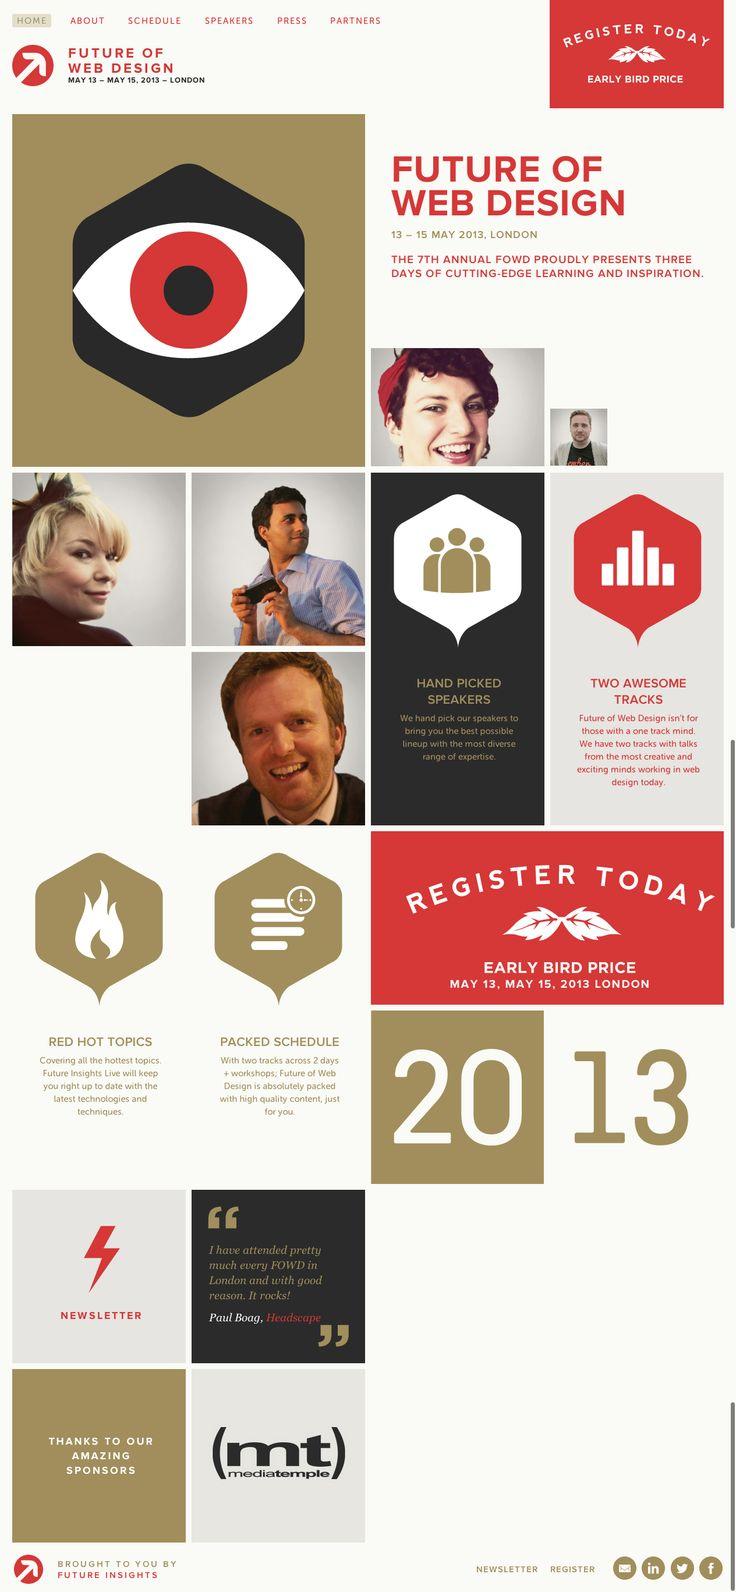 Future of Web Design 2013, Responsive Web Design, more on the Responsive Design Knowledge Hub | Propel Marketing